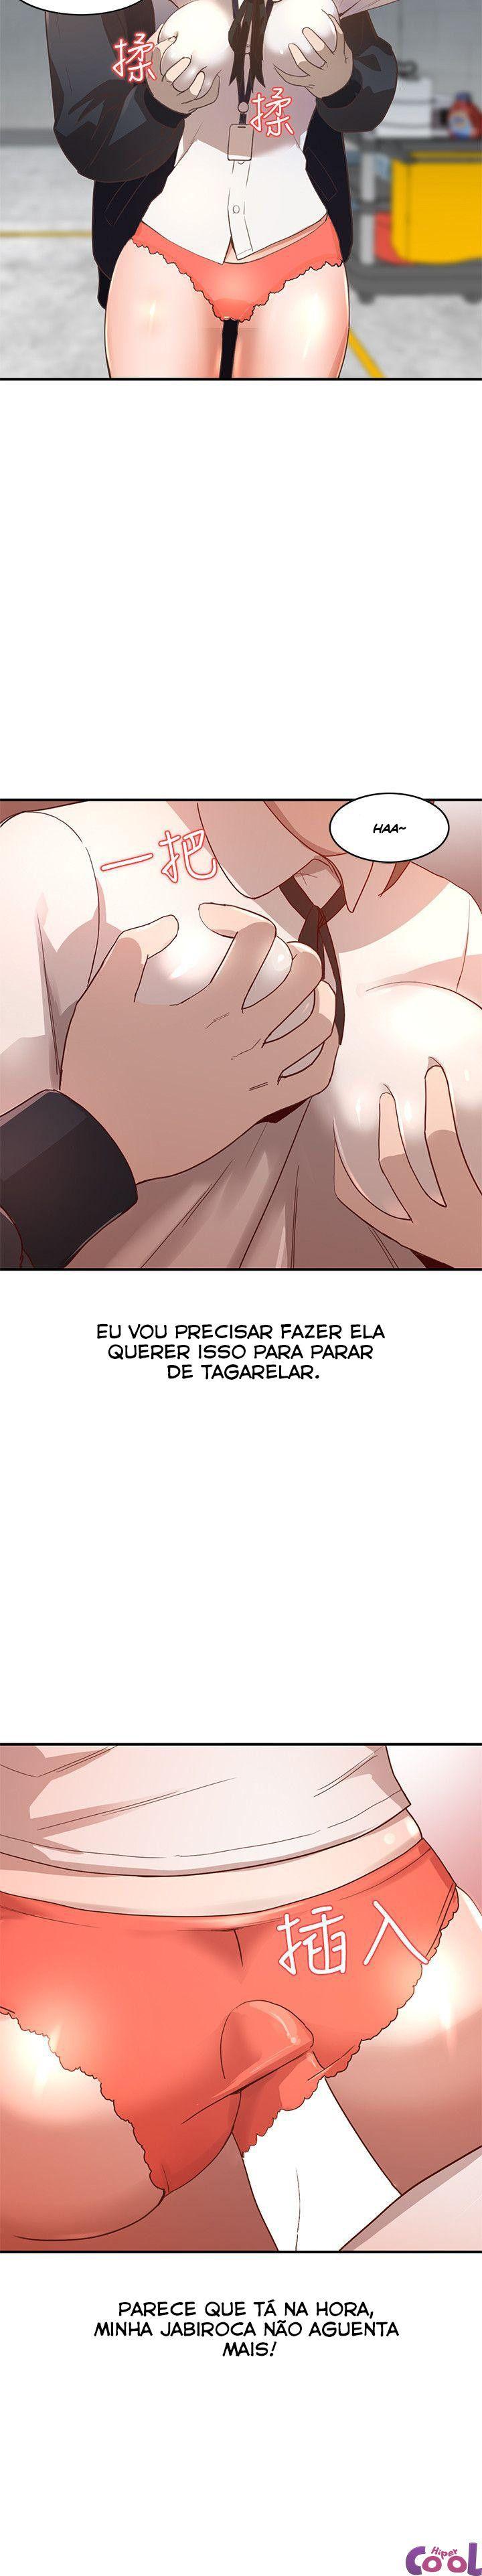 Mulher Casada 04 - Foto 5